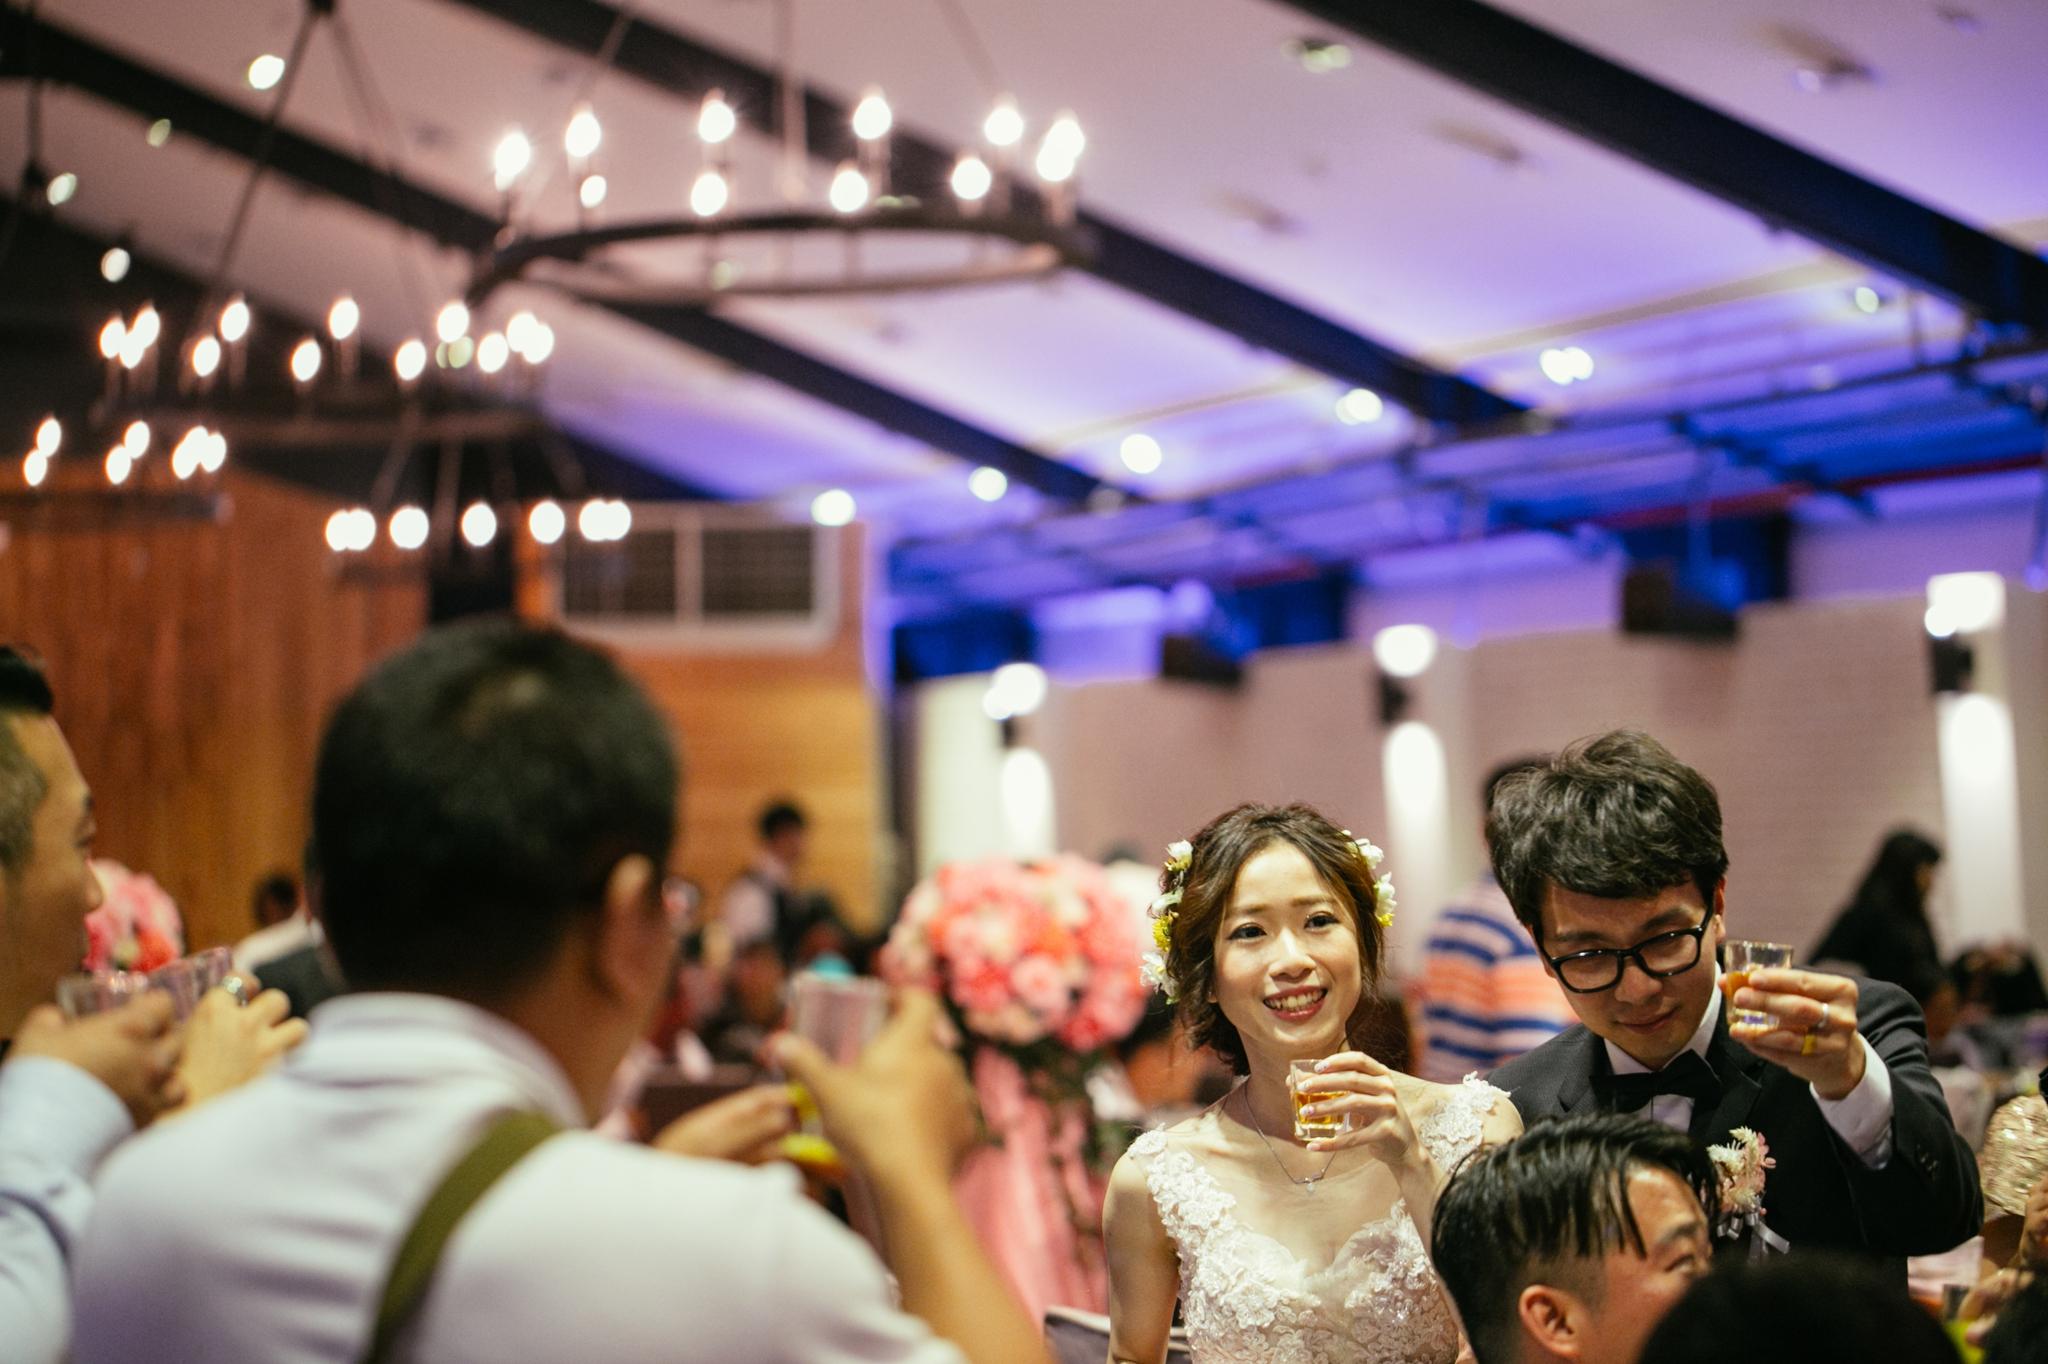 Tina+Nash-wedding-台北婚禮迎娶晚宴-新莊終身大事-148.jpg